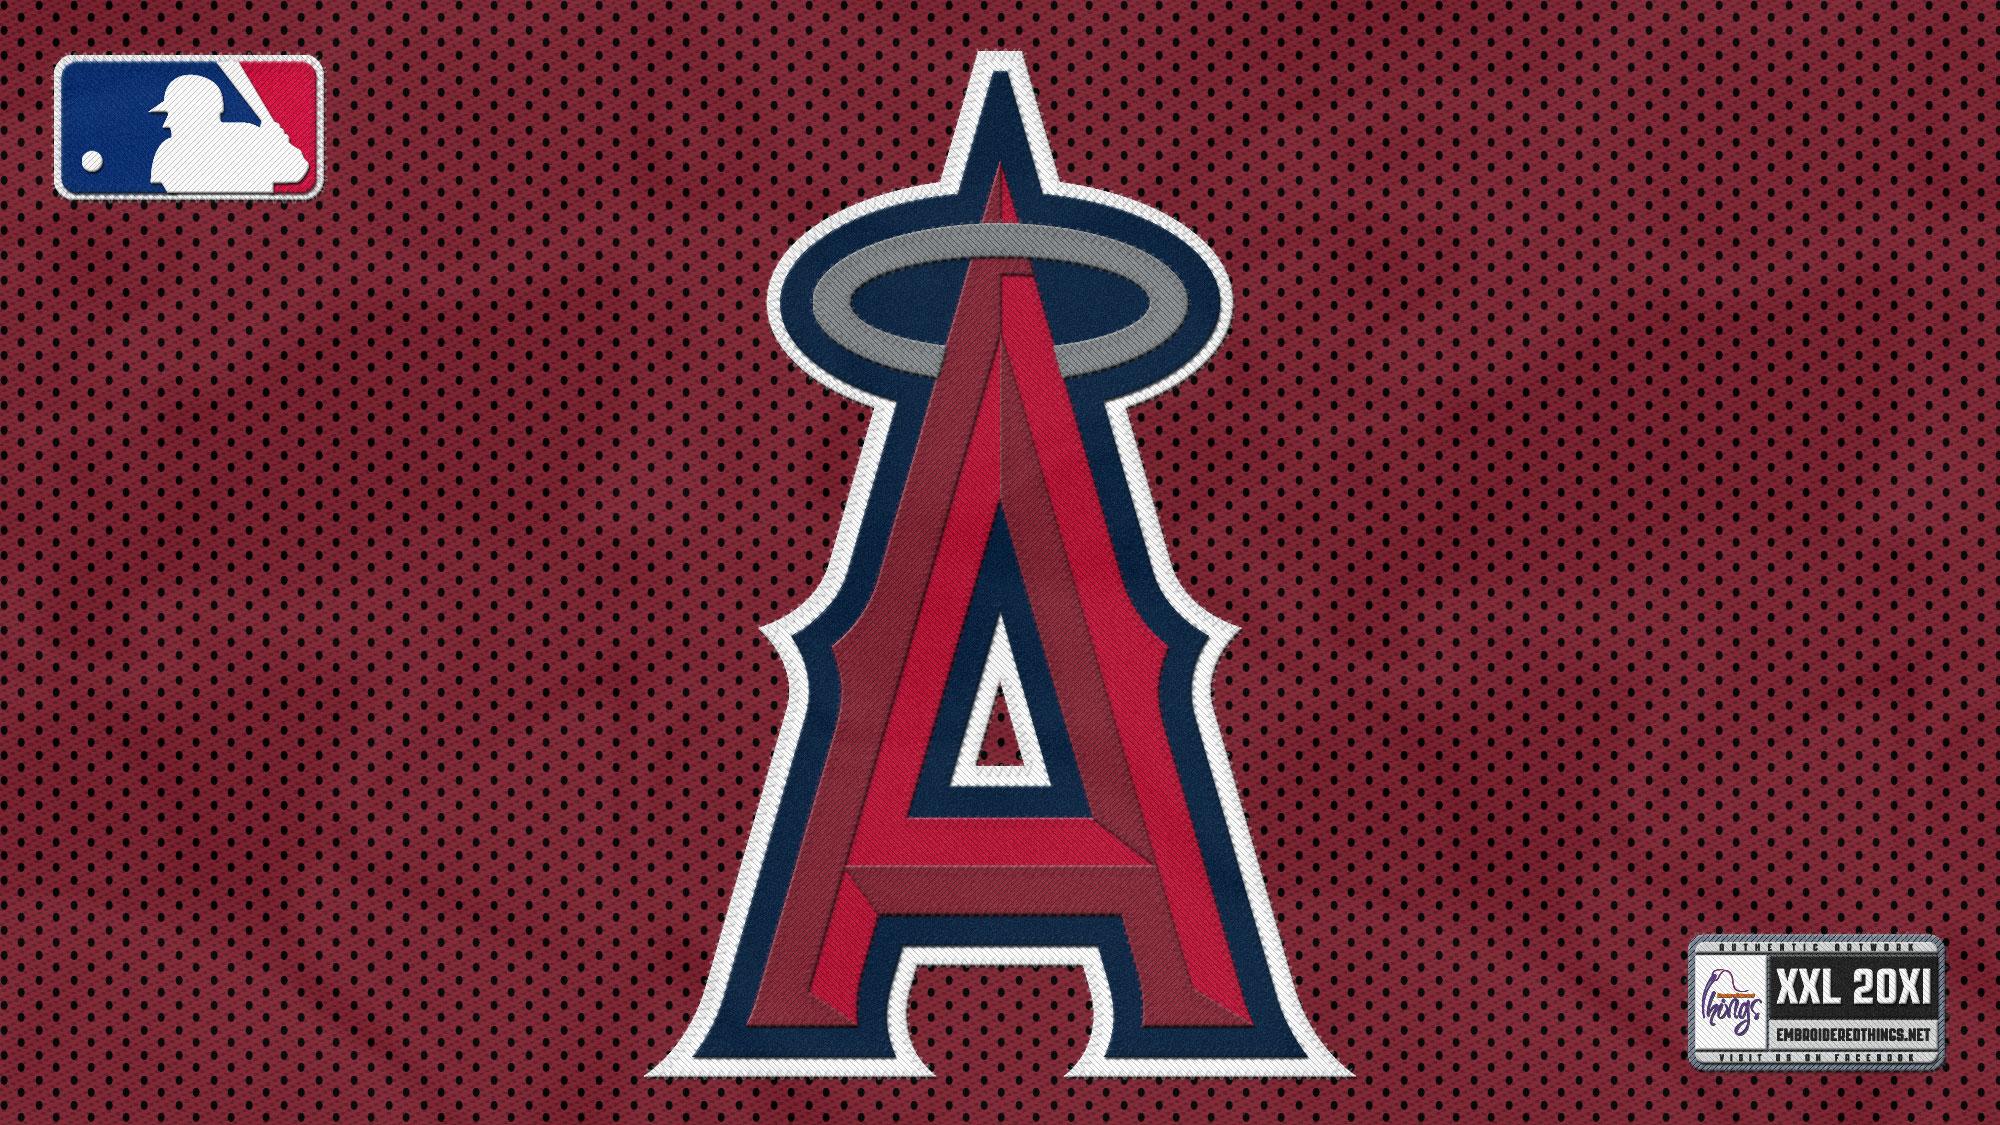 ANAHEIM ANGELS baseball mlb d wallpaper 2000x1125 158462 2000x1125